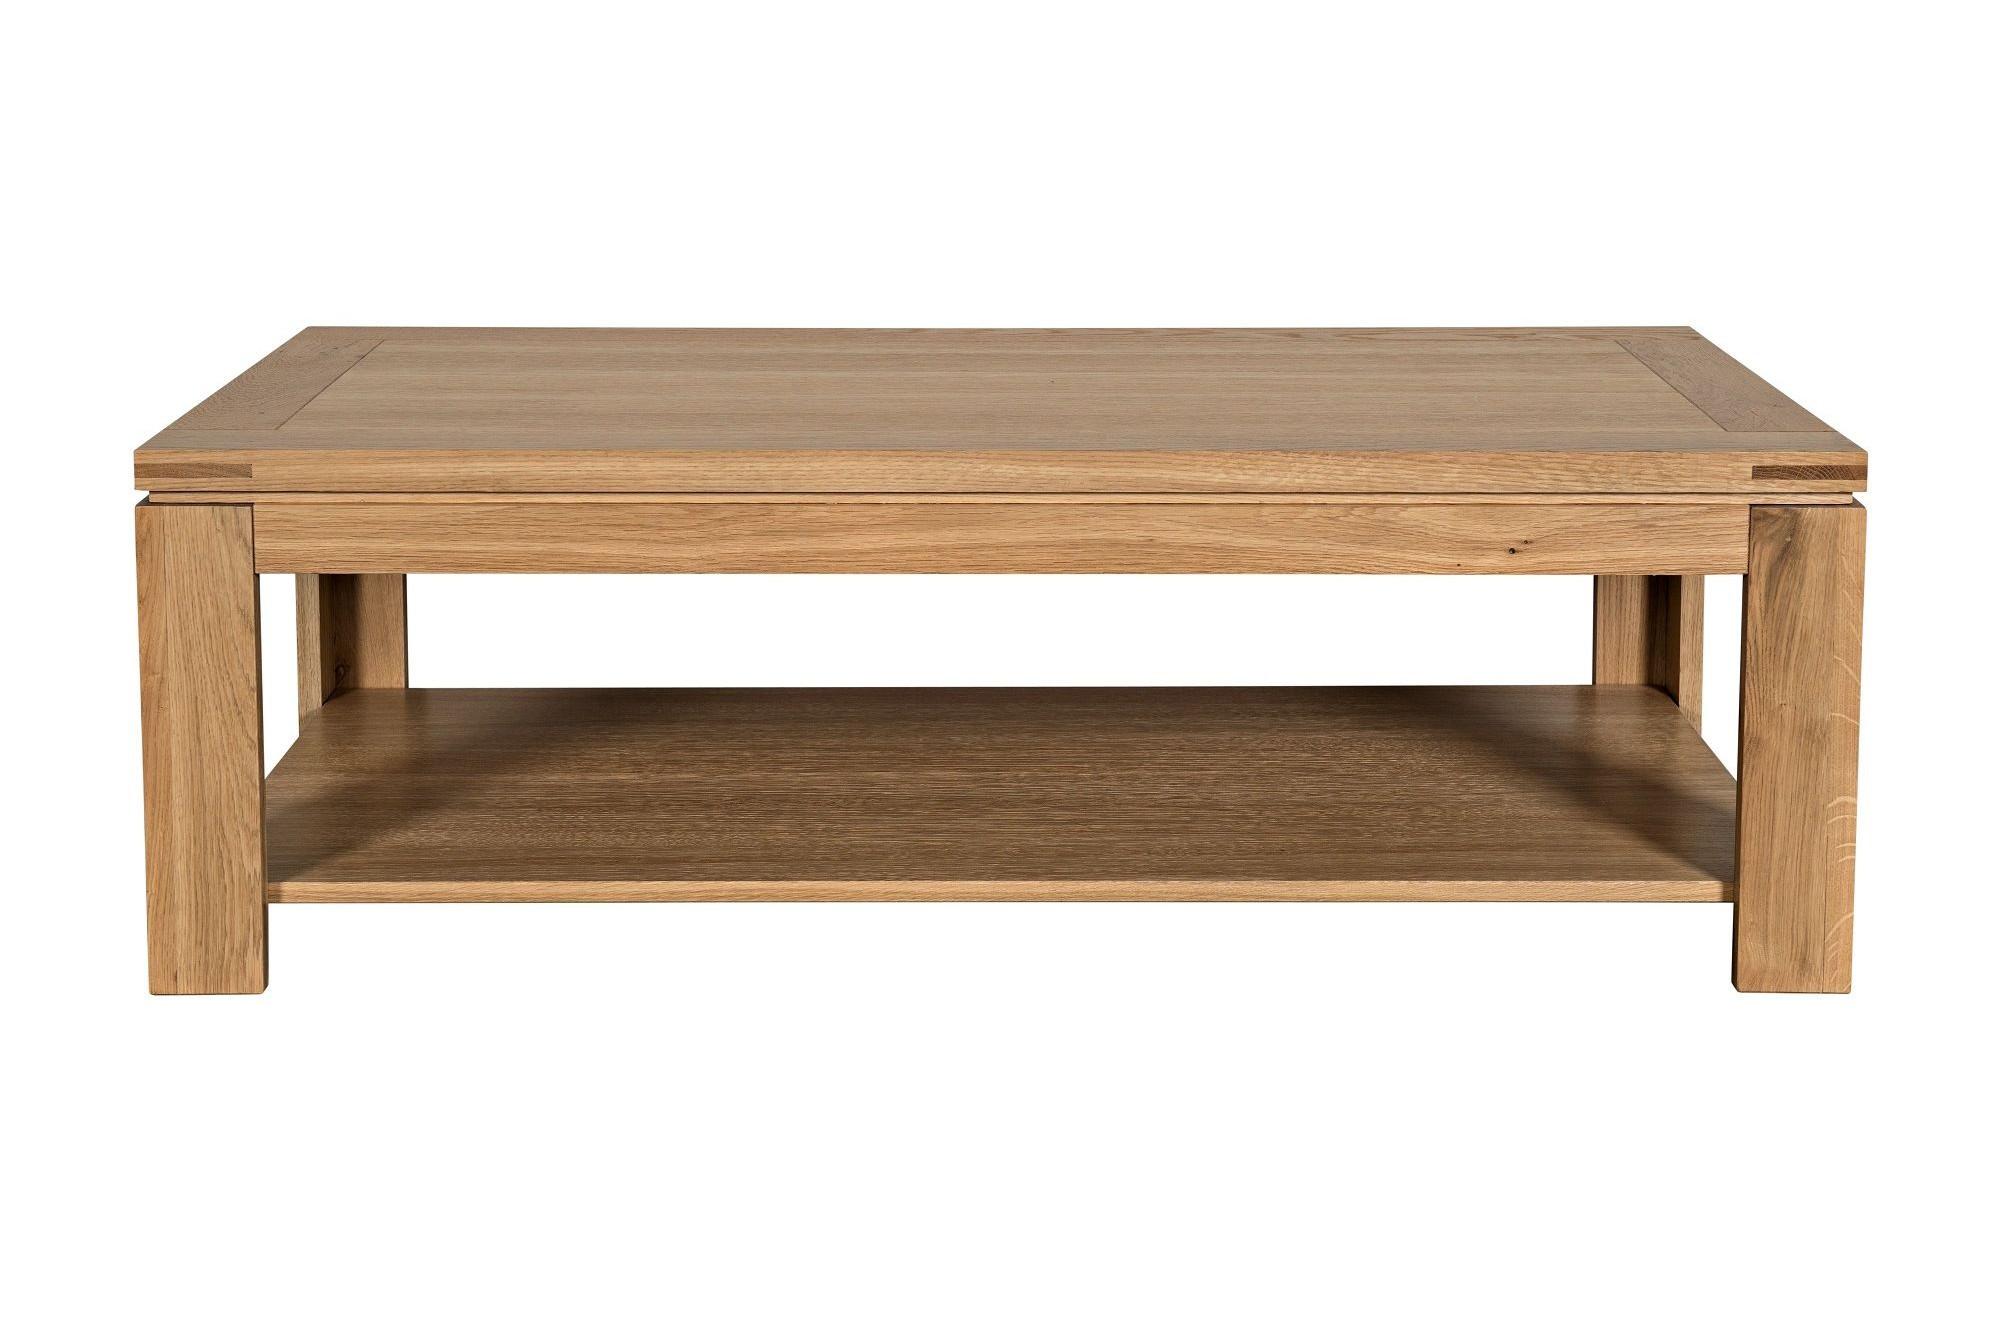 ca03e8e306af6 Table basse moderne BOSTON - bois chêne clair massif. Appuyez pour agrandir